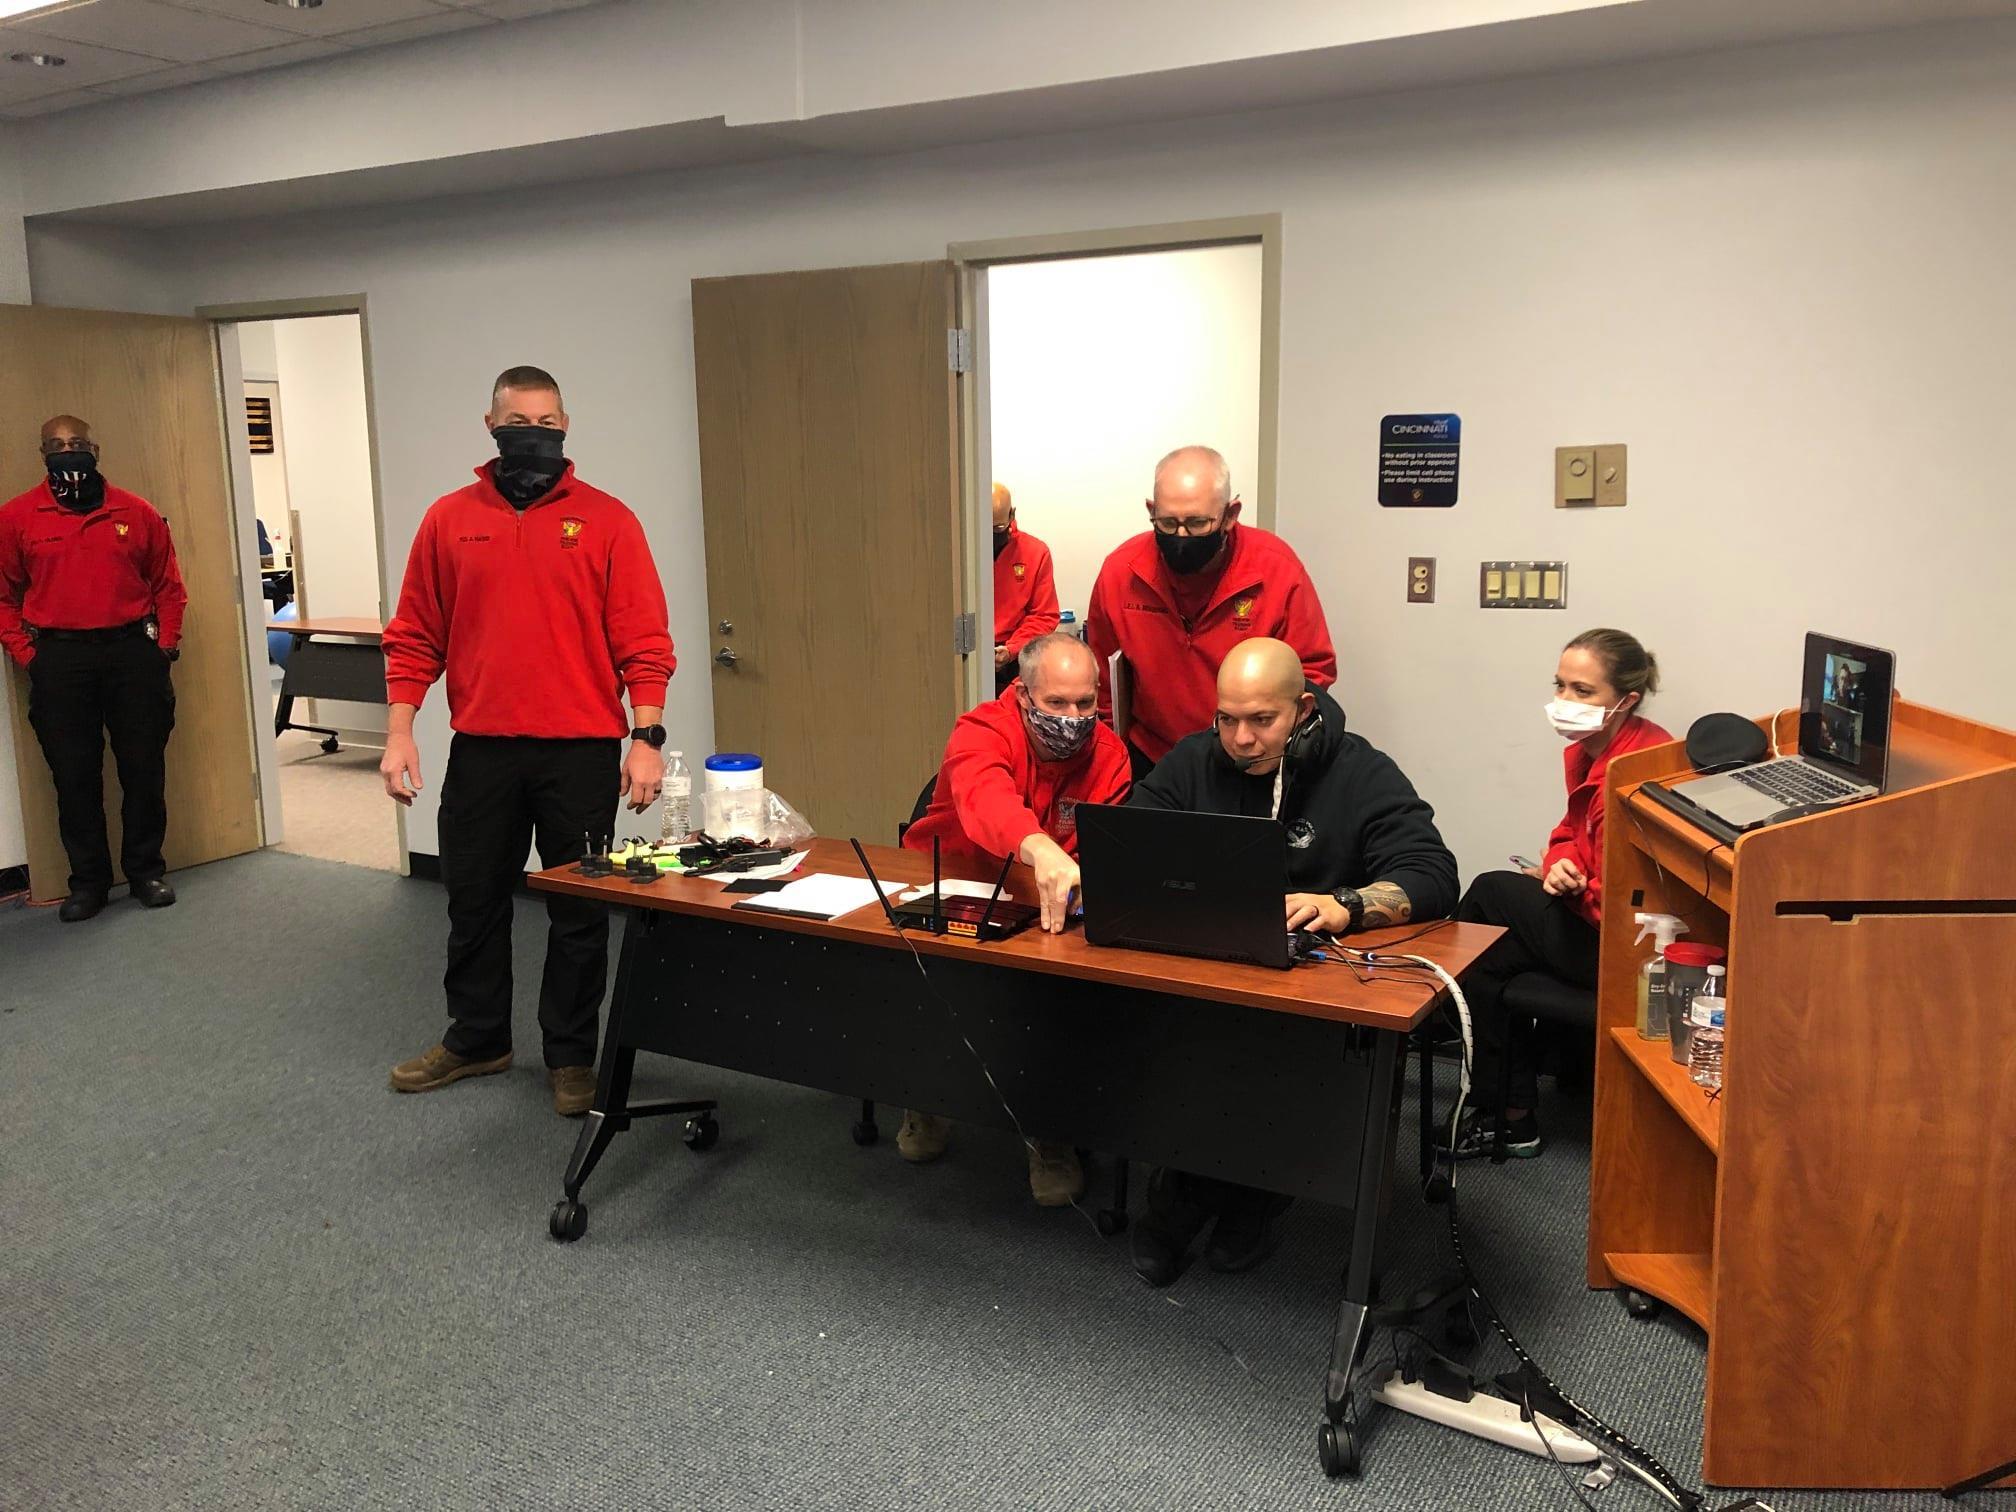 Cincinnati Police Academy Instructors Operating the Apex Officer Simulator